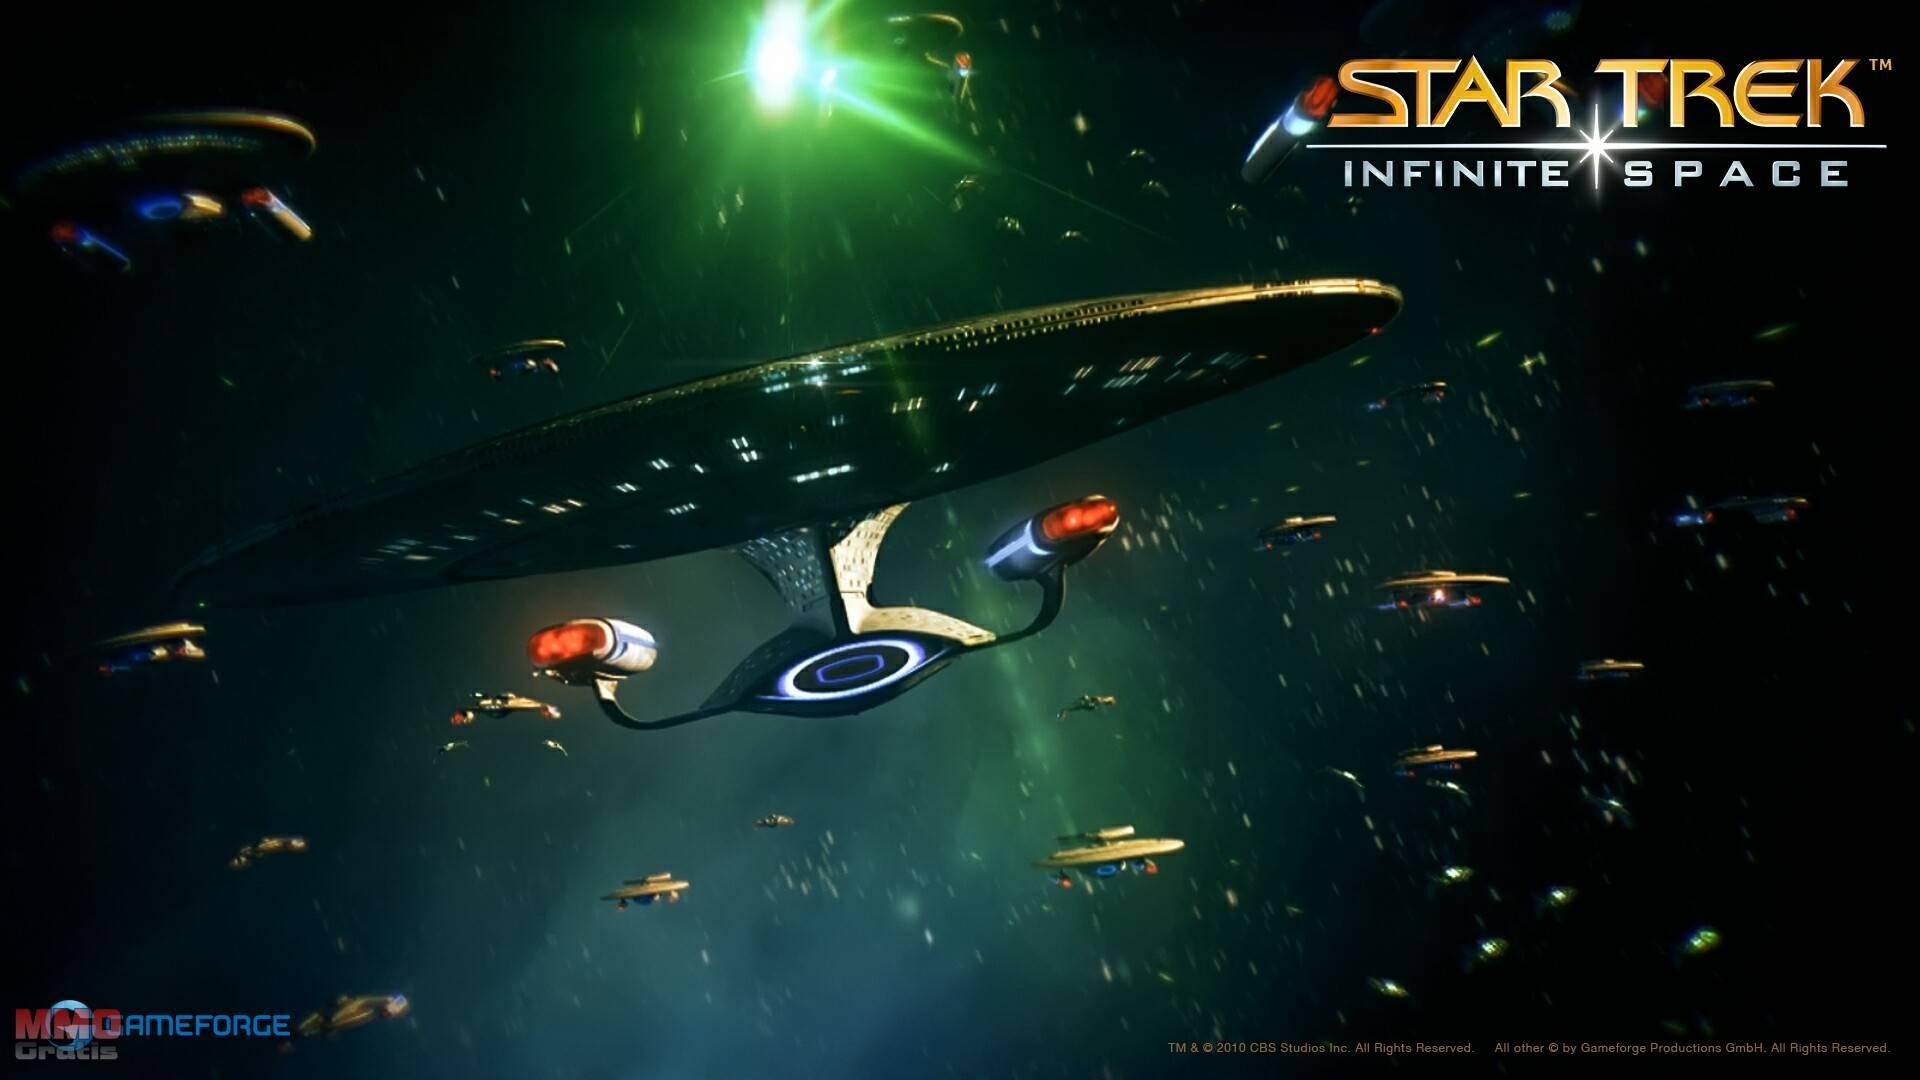 Nuevos Wallpapers Full Hd De Star Trek Infinite Space